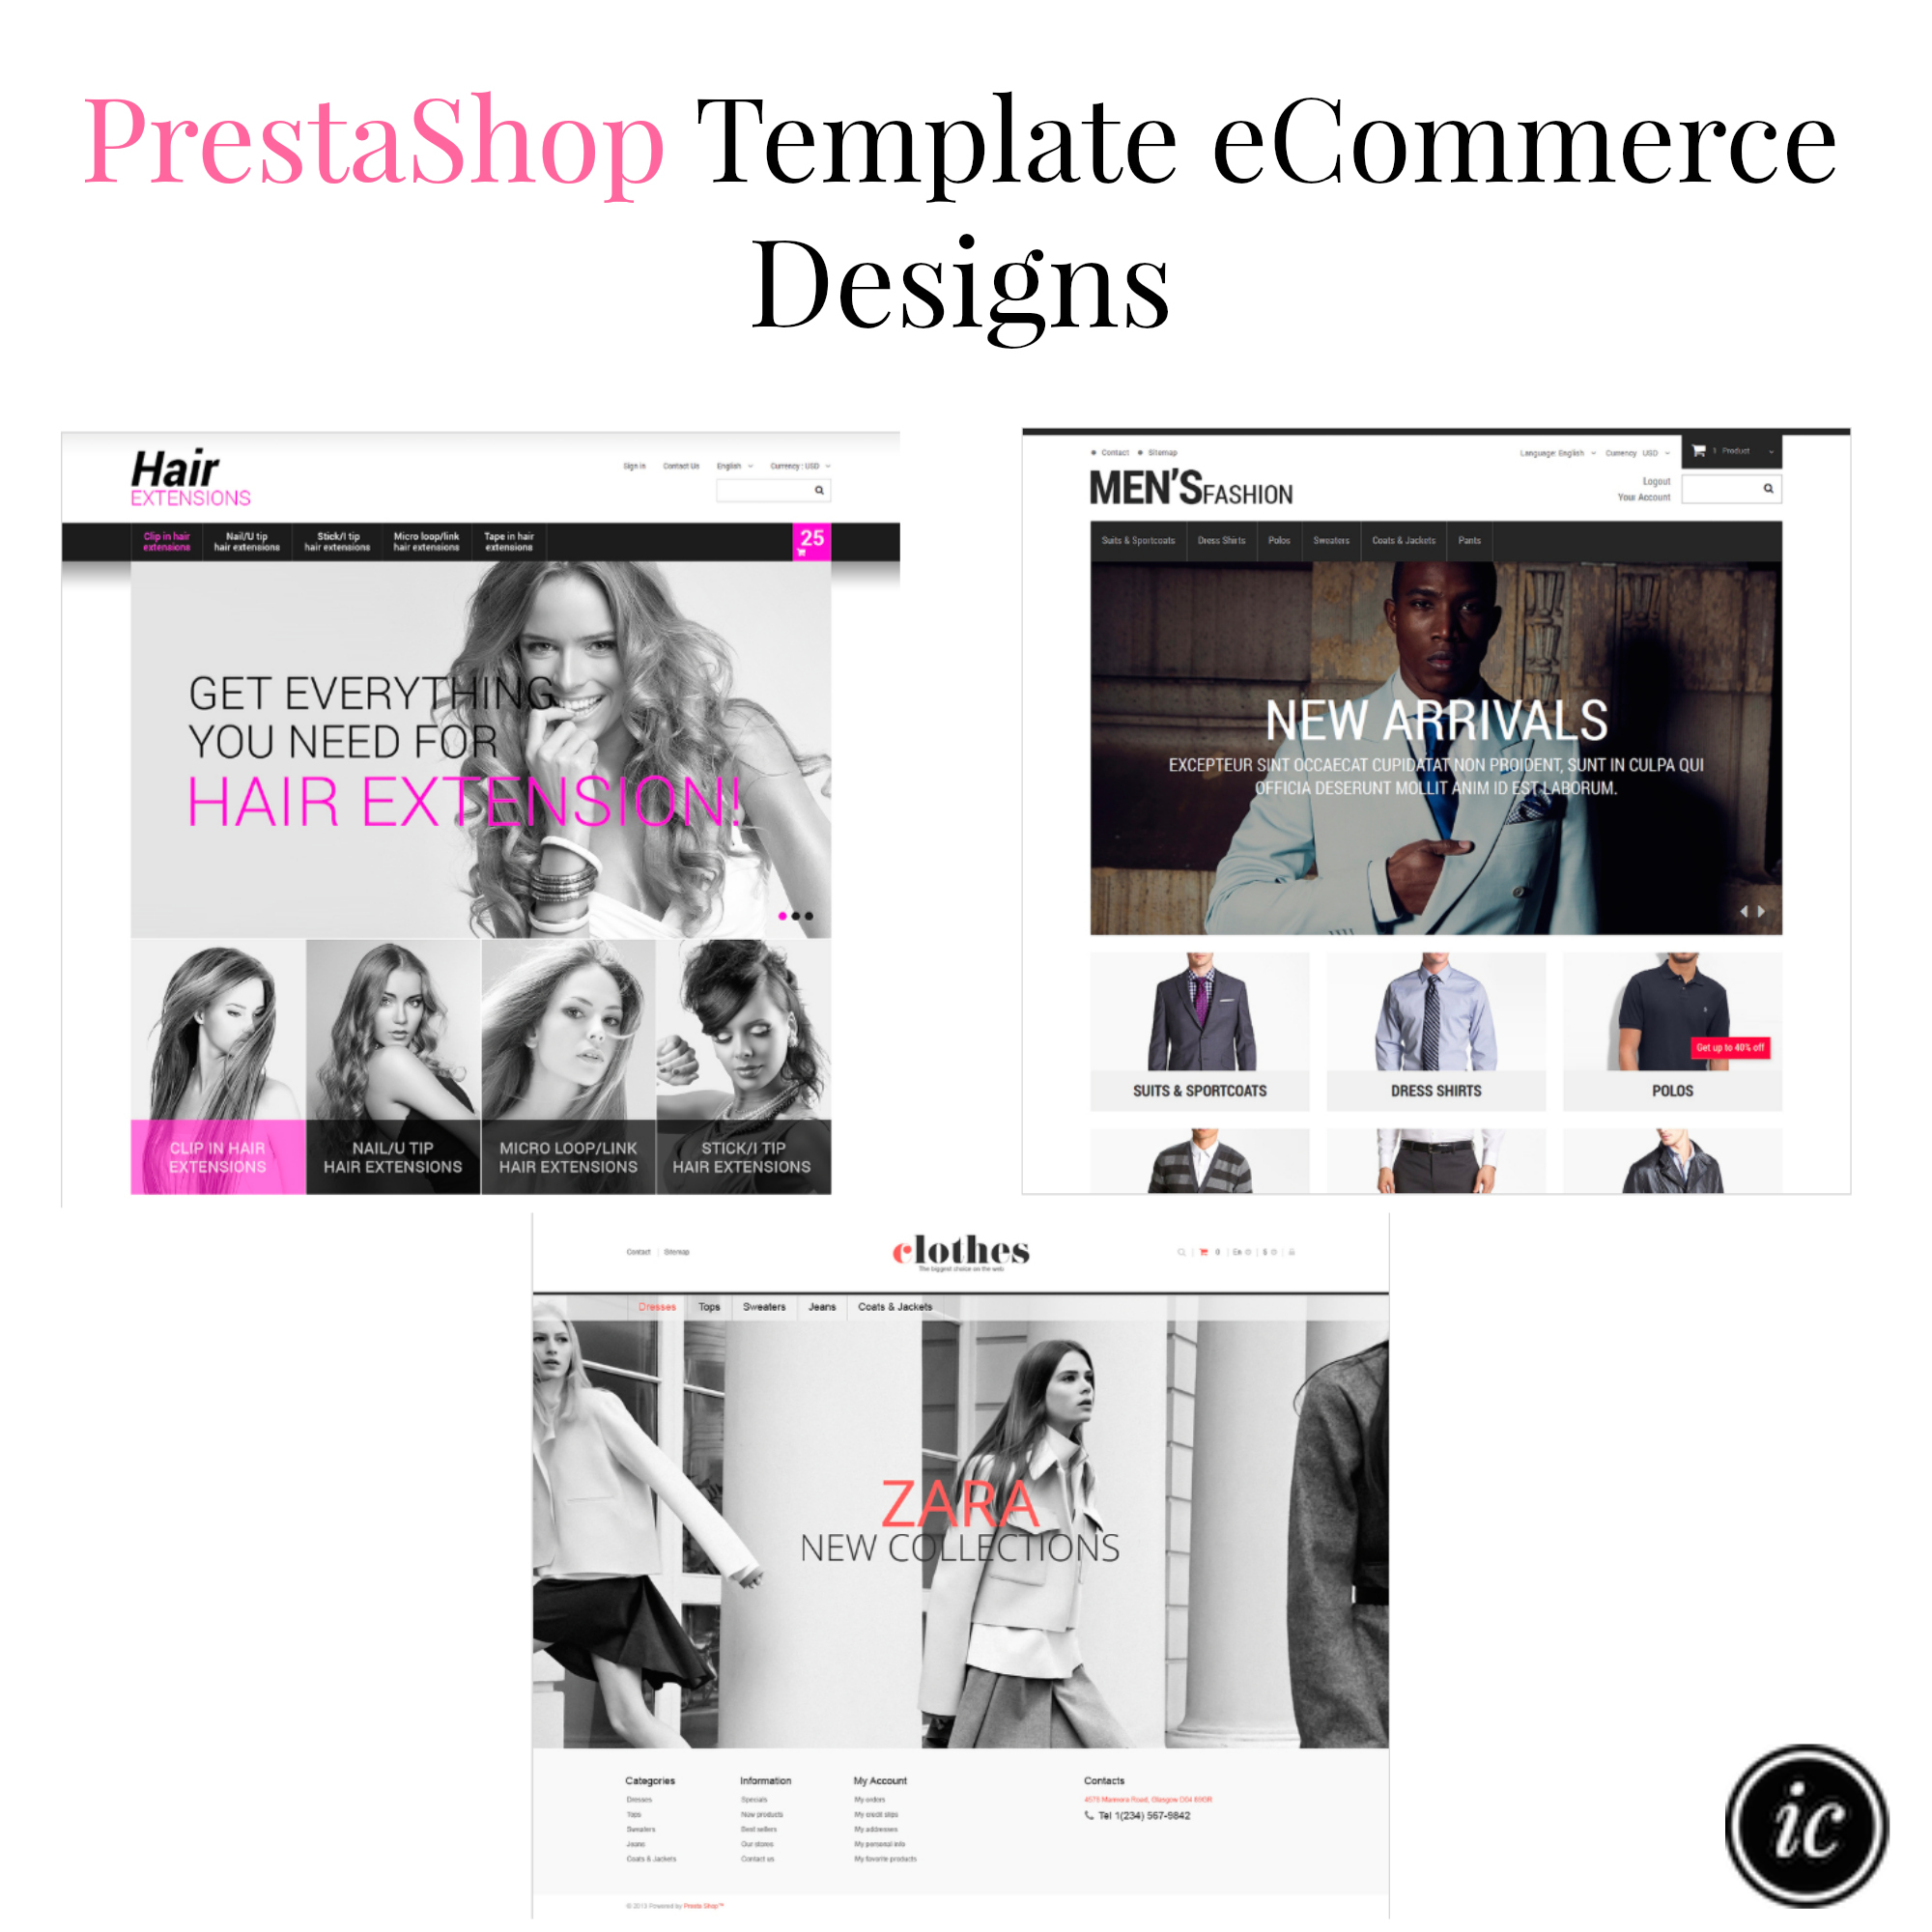 PrestaShop Template eCommerce Designs